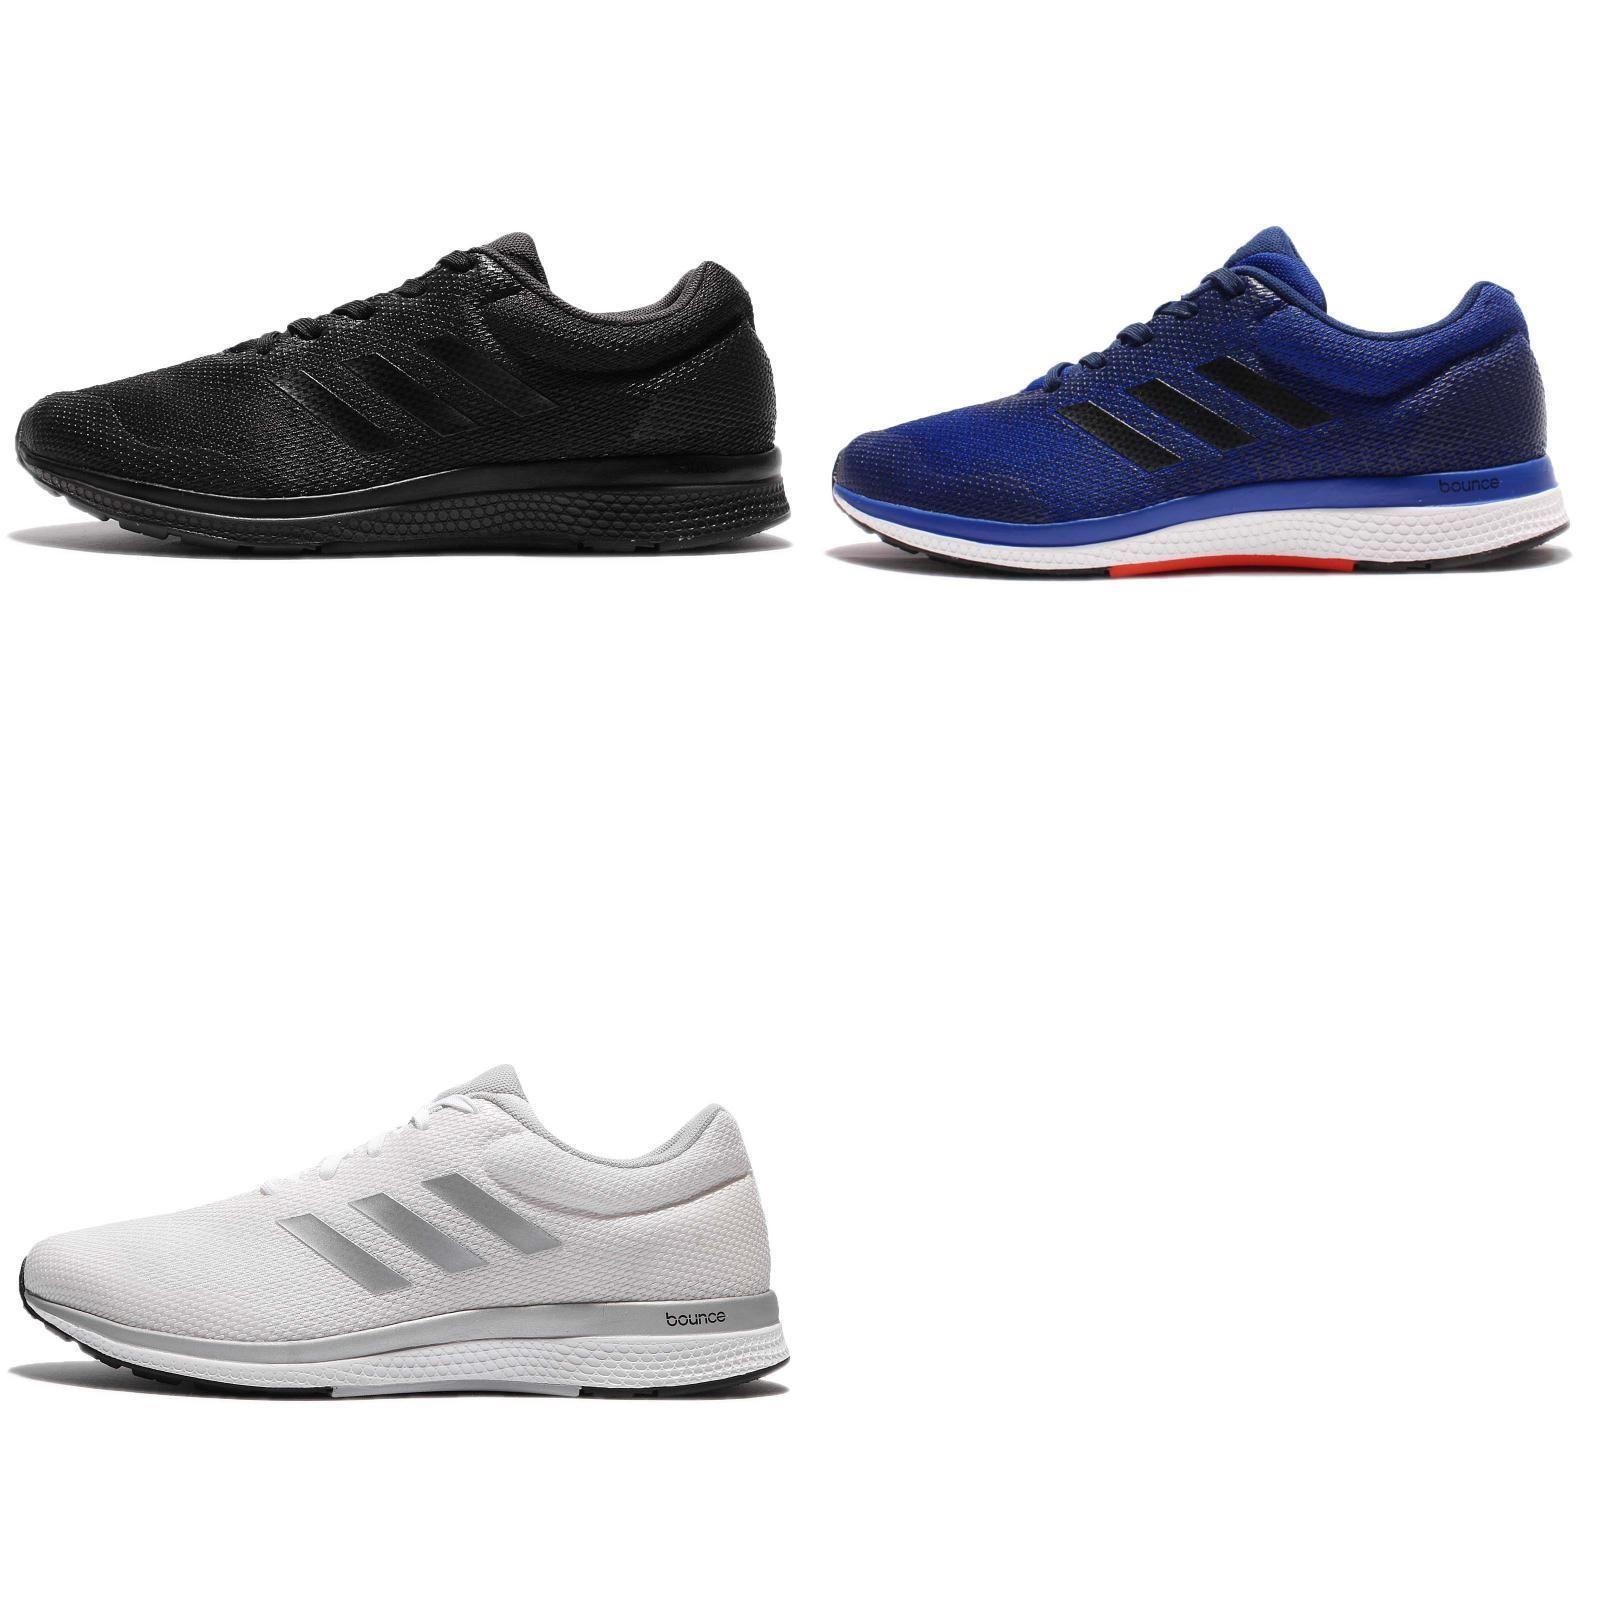 adidas Mana Bounce 2.0 M Aramis II Men Running Shoes Sneaker Pick 1